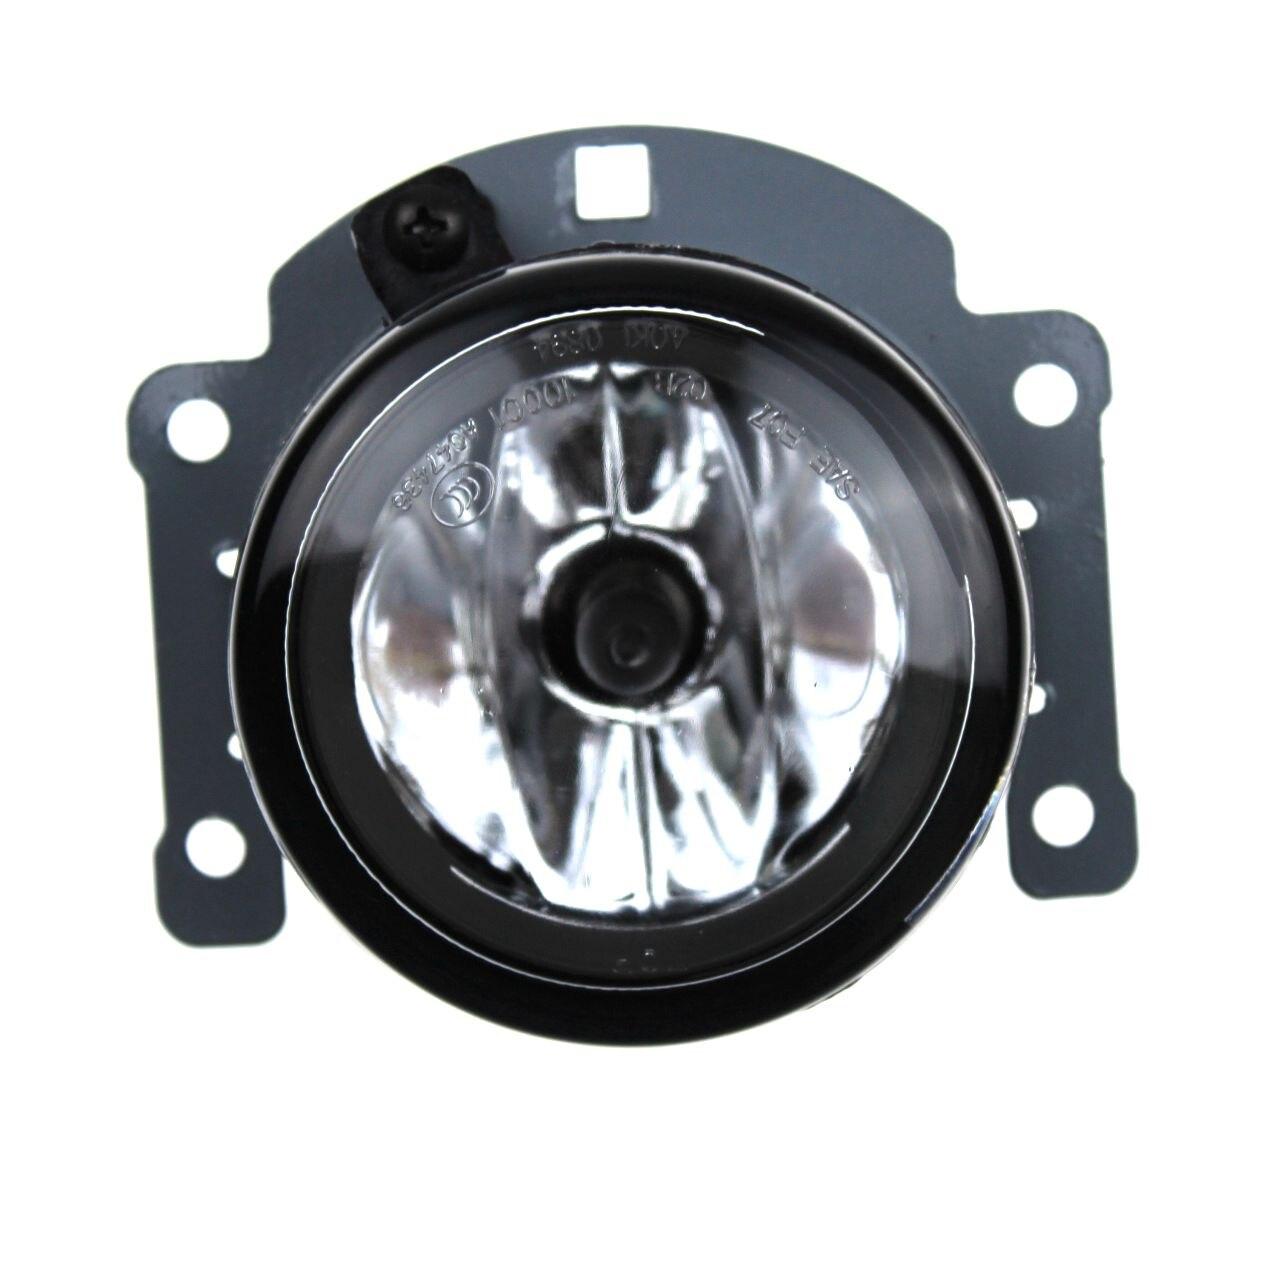 LARATH 1PCS New Left / Right Front Fog lamp Light Fits Mitsubishi Outlander ASX RVR 8321A467 SL870-1 12V 55W<br>